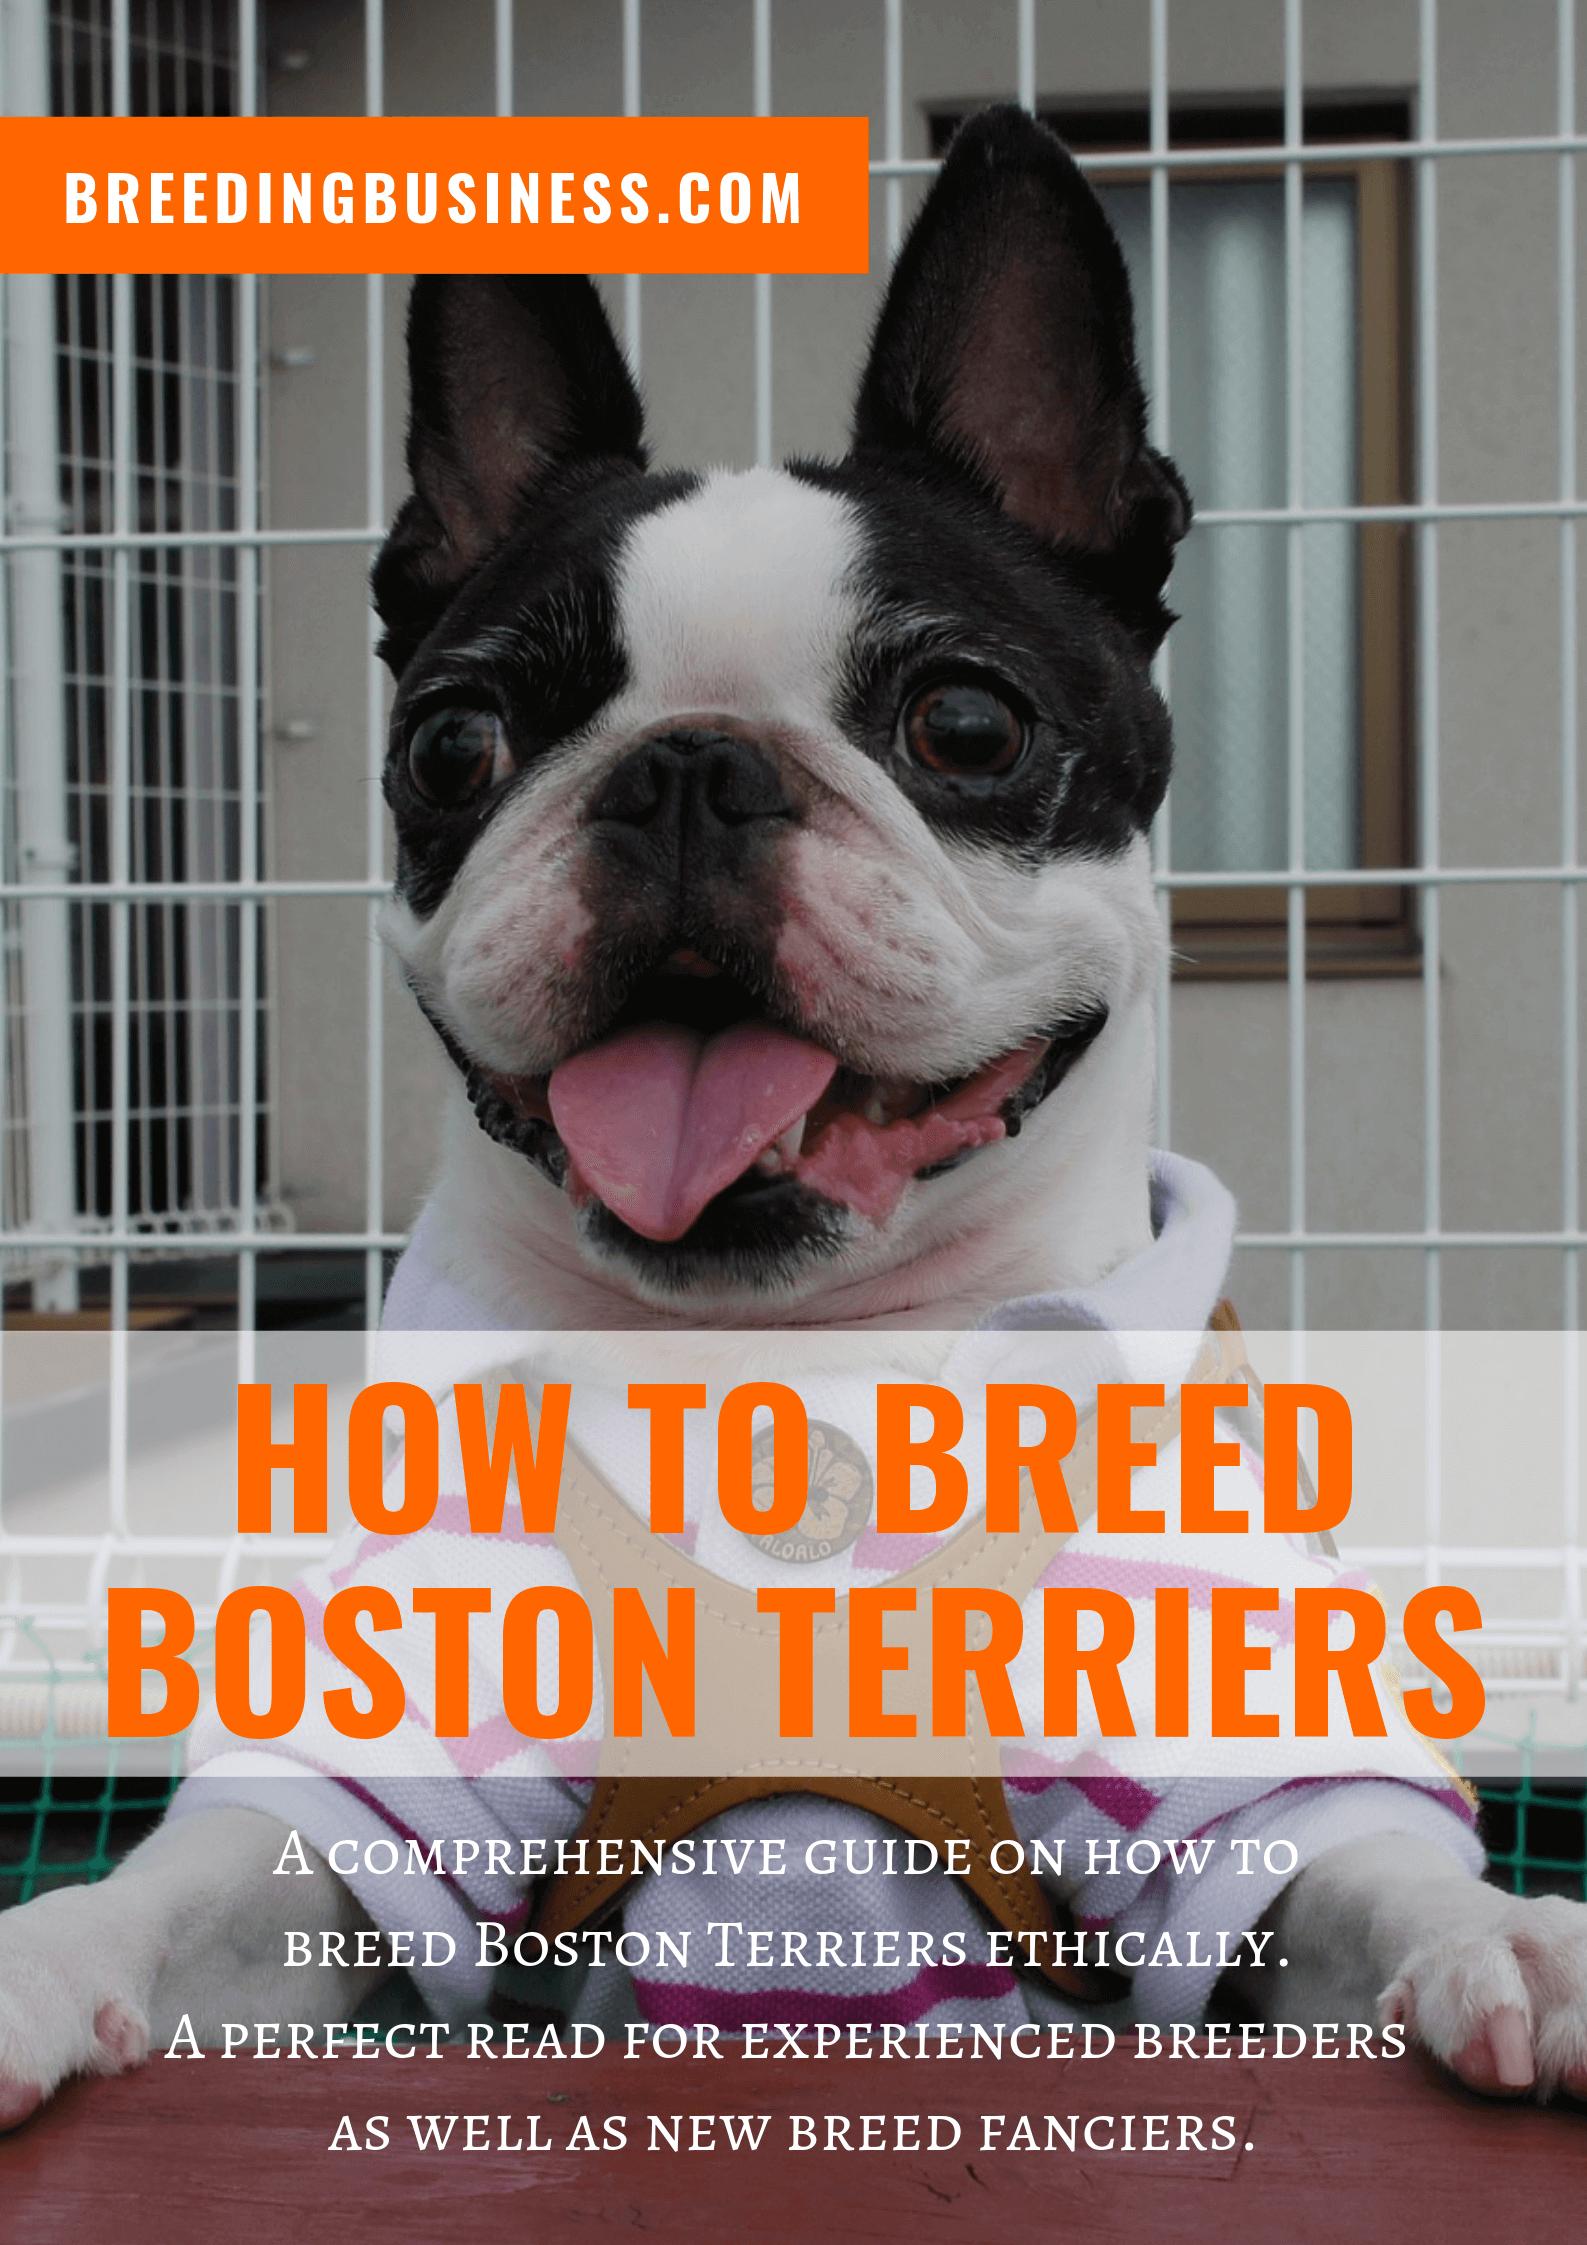 breeding Boston Terriers